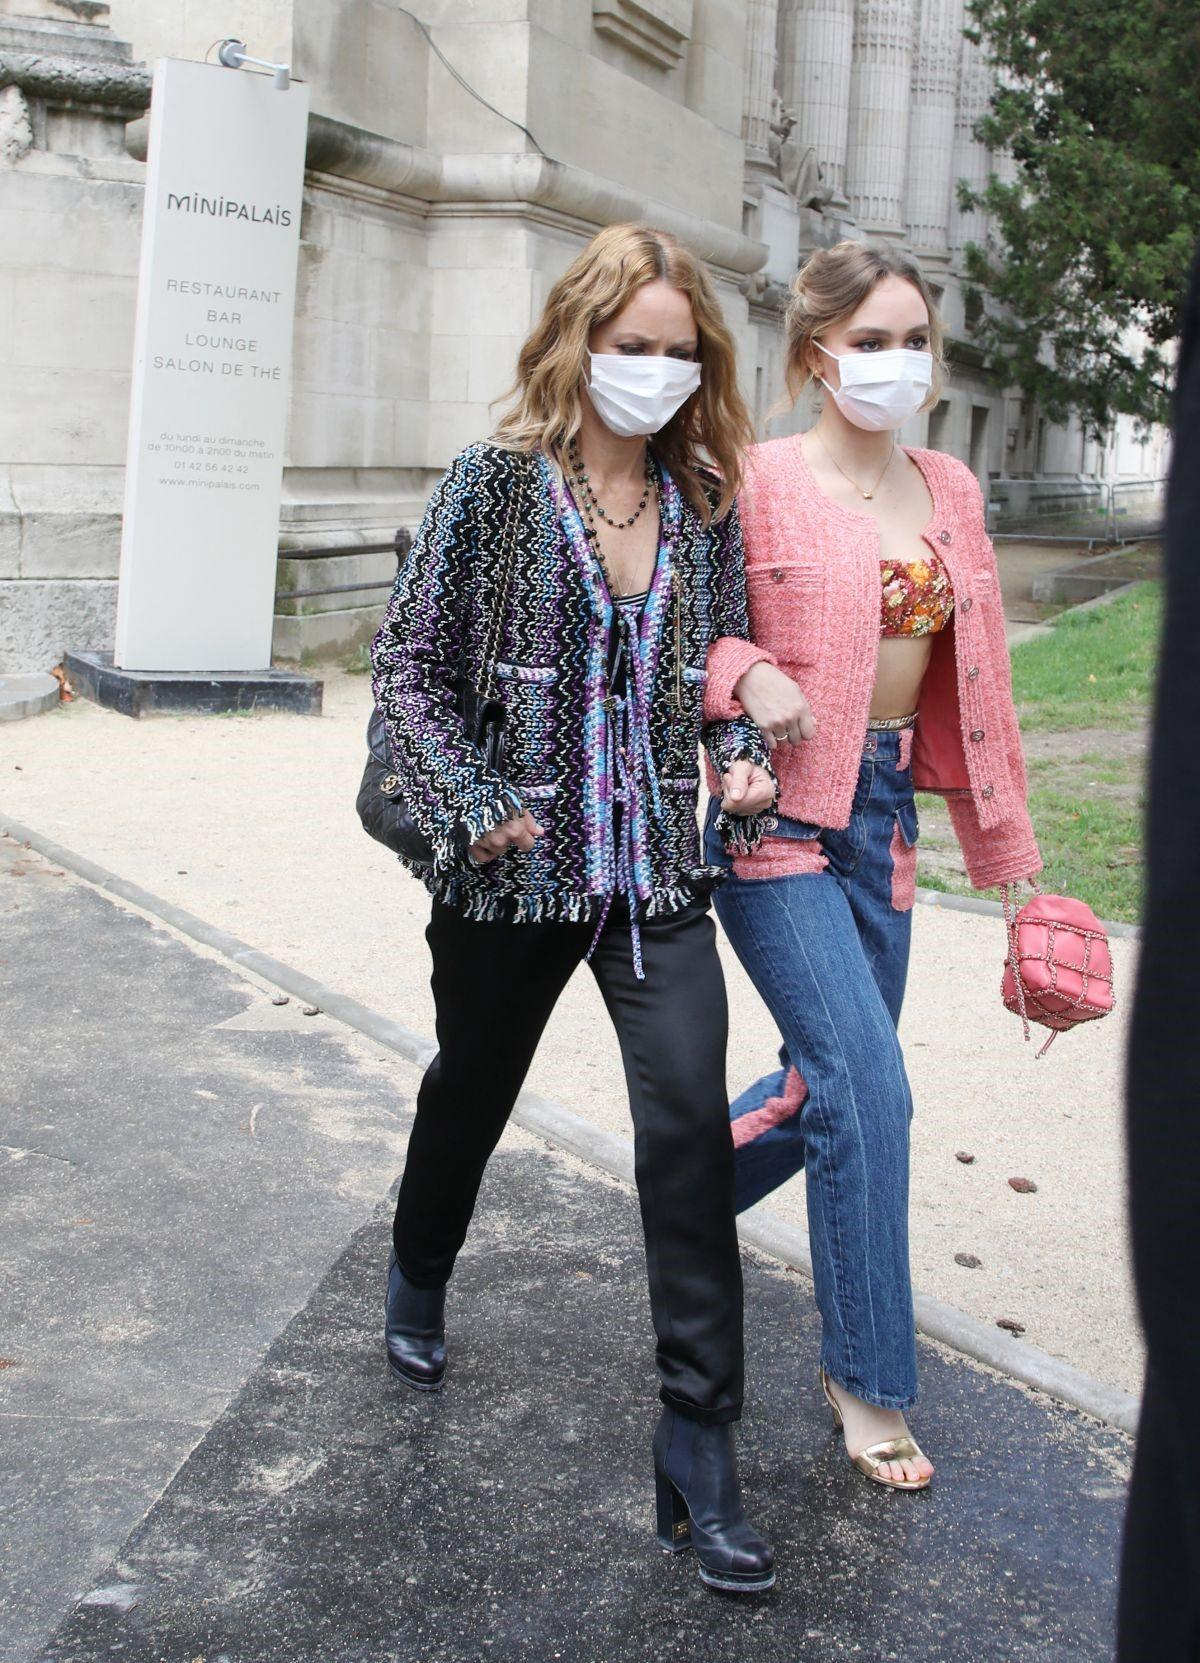 Мамина дочка: Ванесса Паради и Лили-Роуз Депп посетили показ Chanel